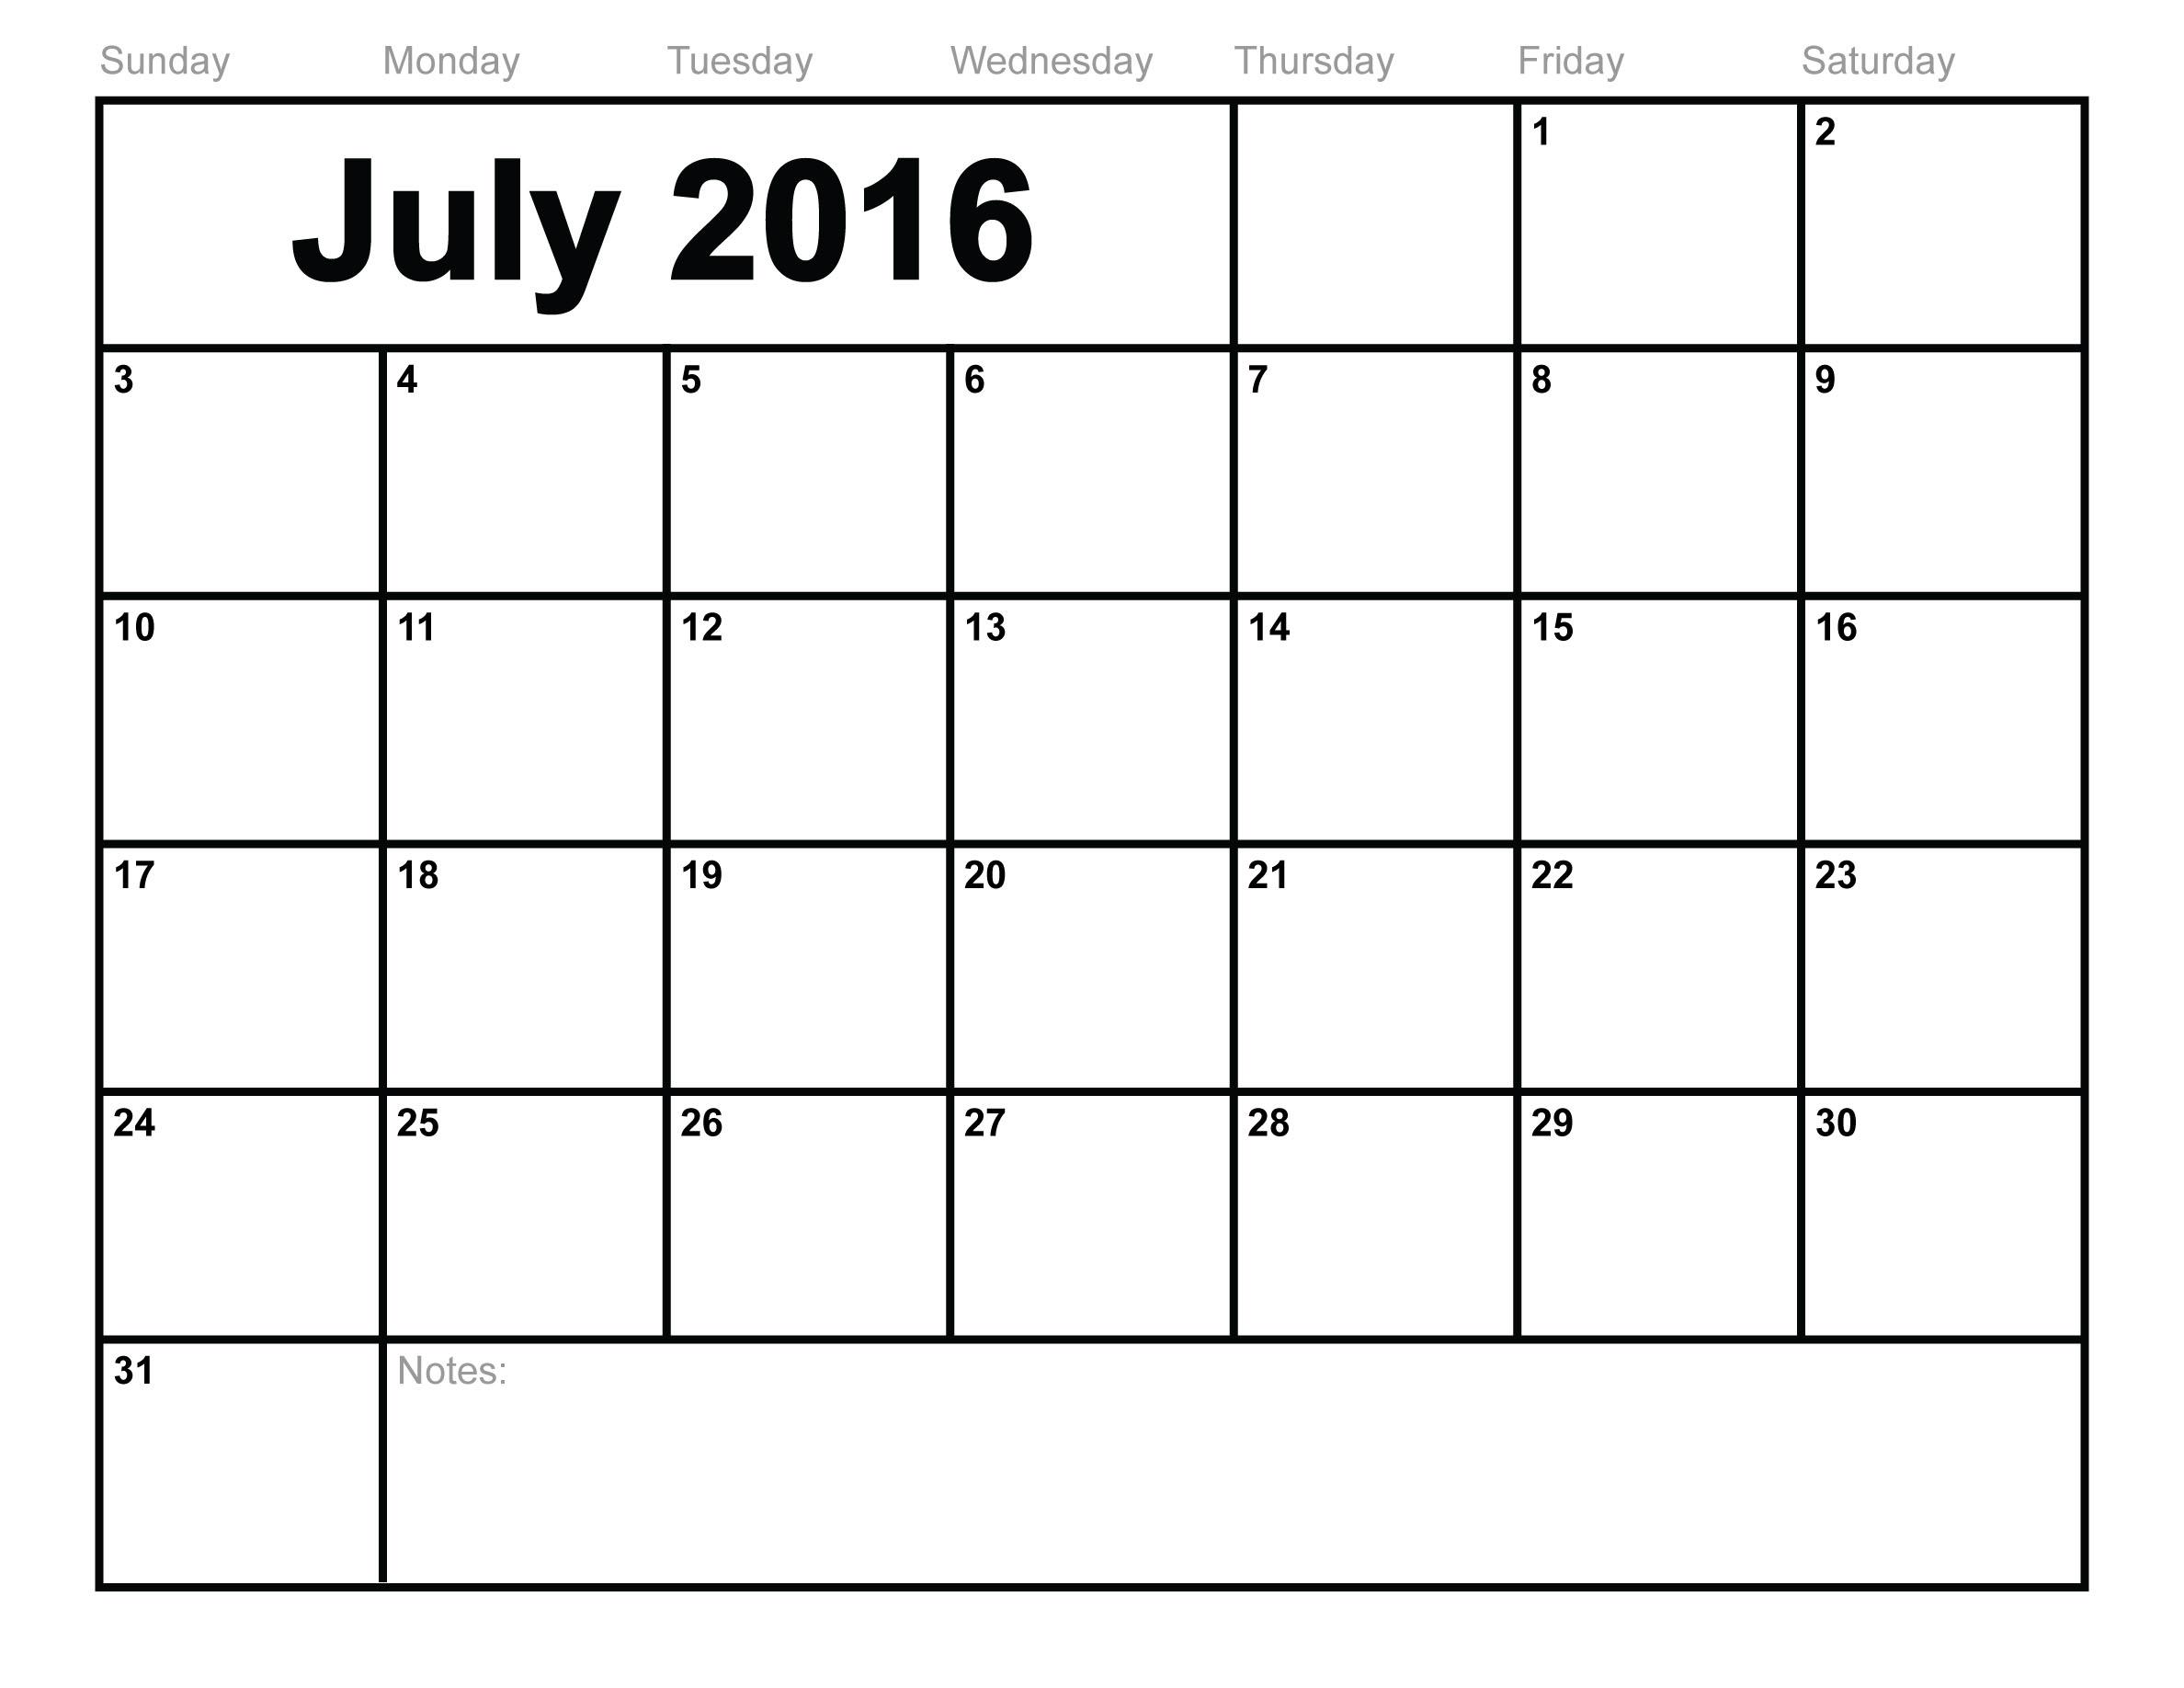 April 2016 calendar clipart banner freeuse download July 2016 Calendar Clipart banner freeuse download